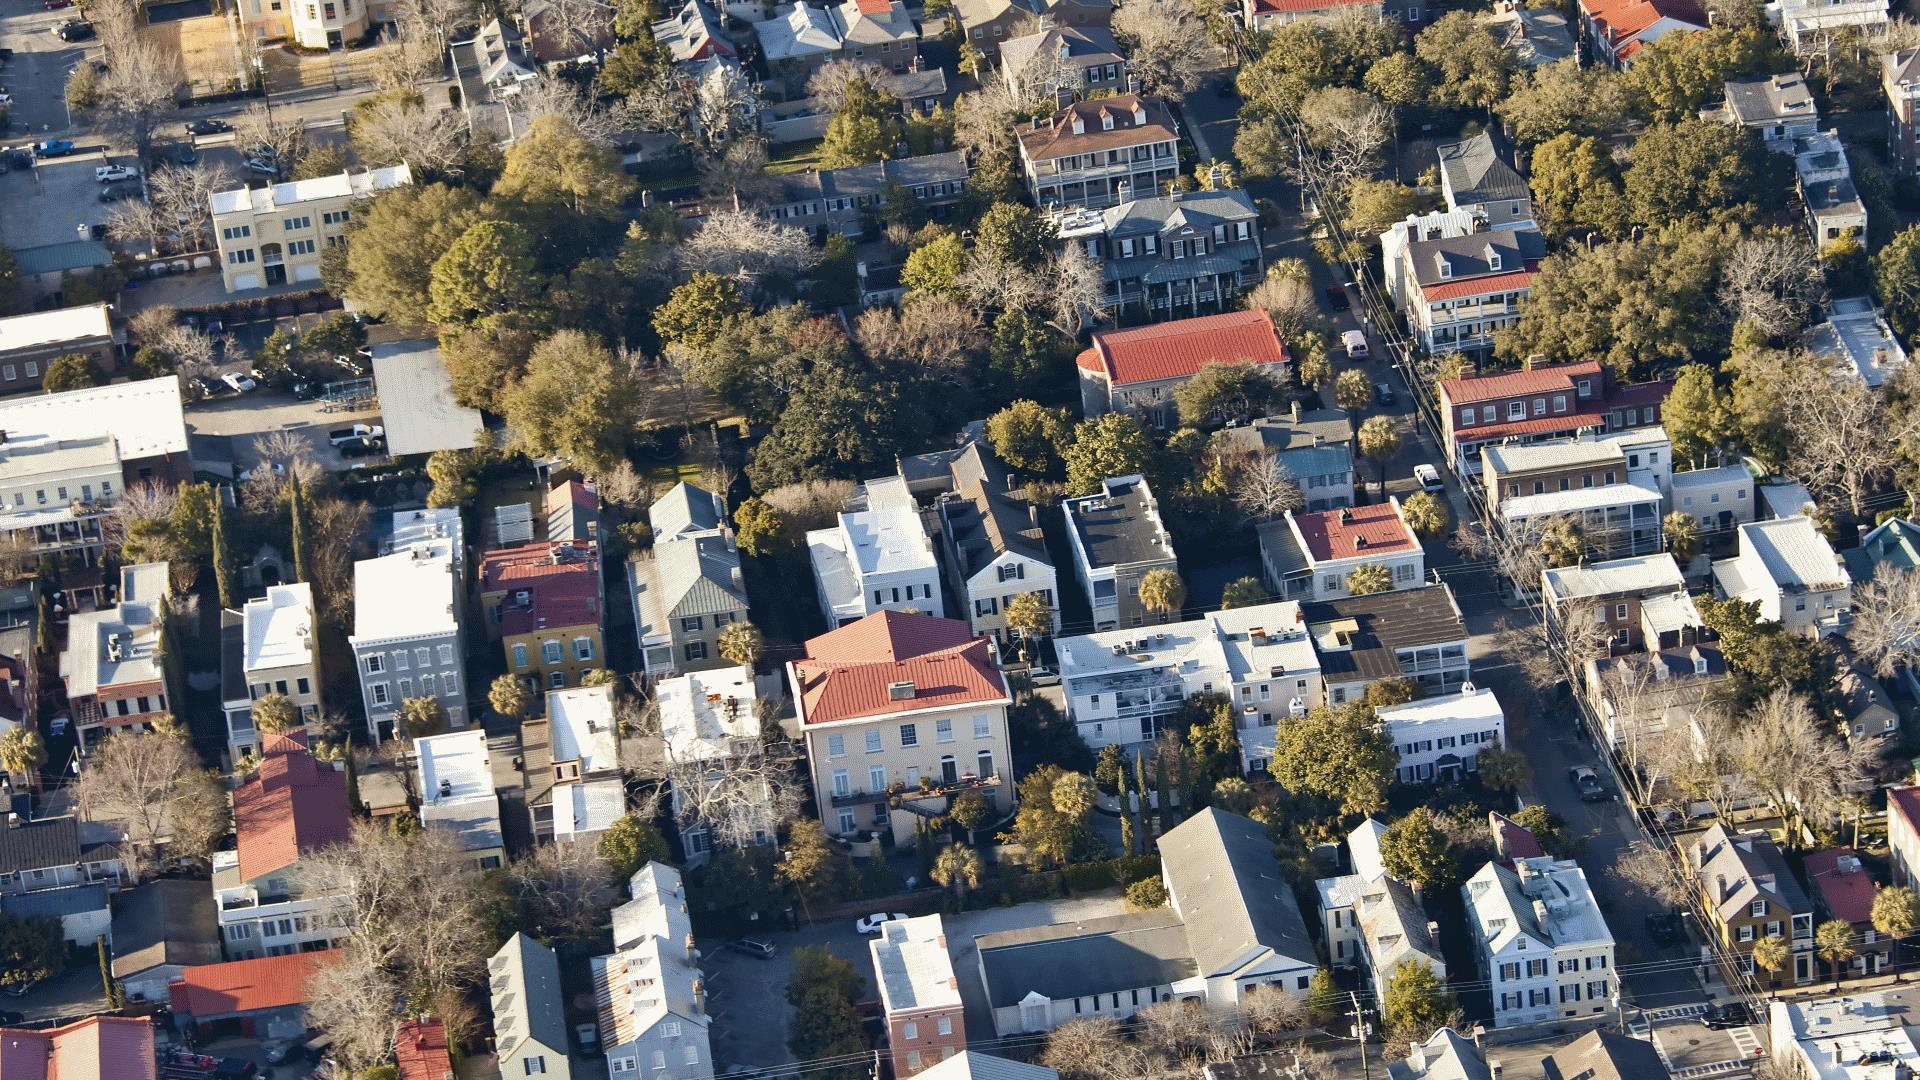 Surprising Link Between Home Values And Presence Of Target Stores In Neighborhoods